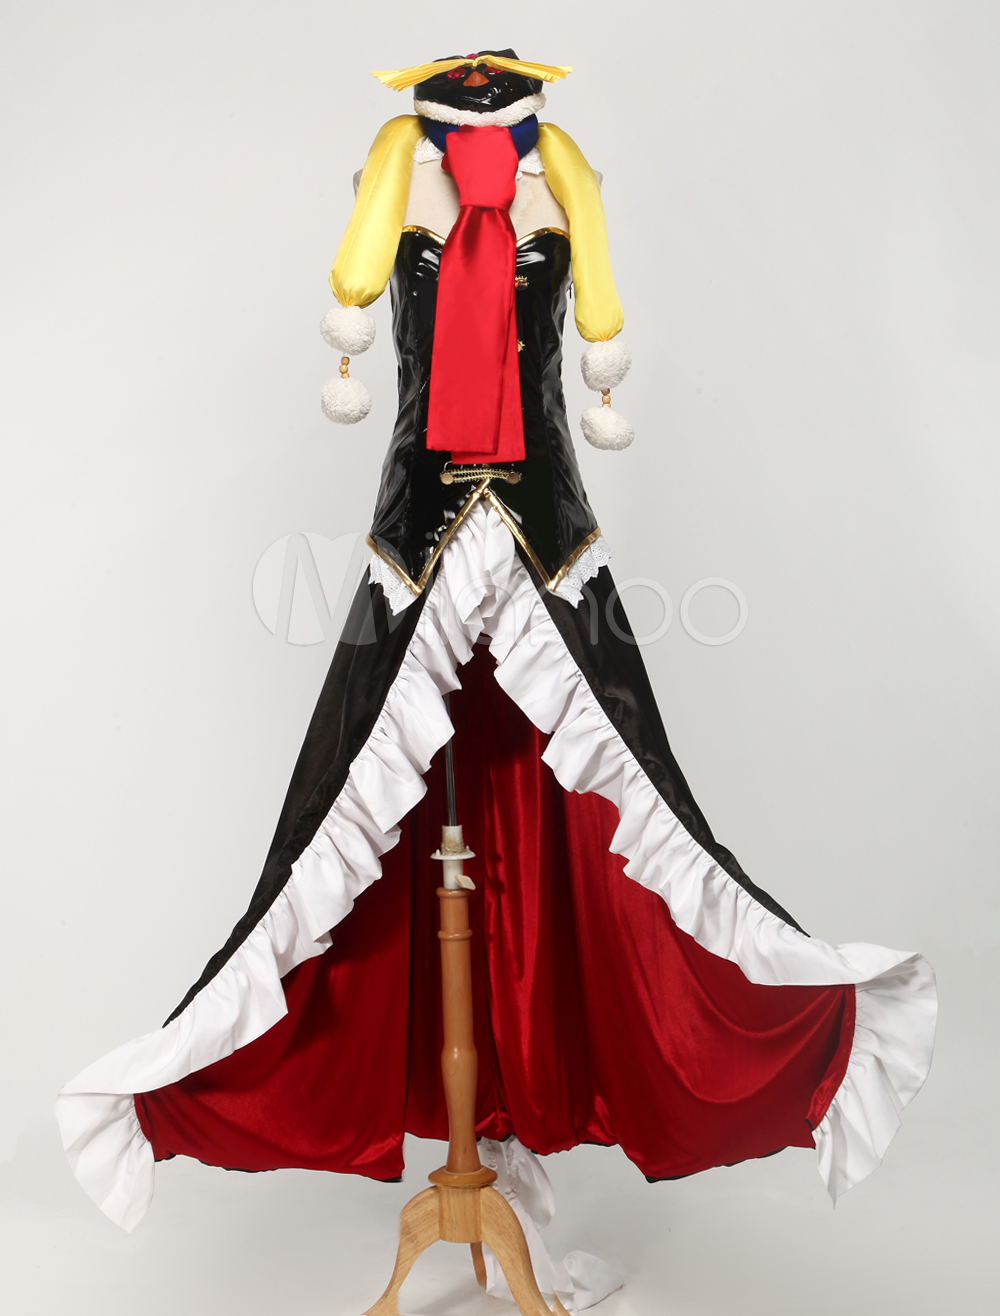 mawaru-penguindrum-takakura-himari-coaplay-costume